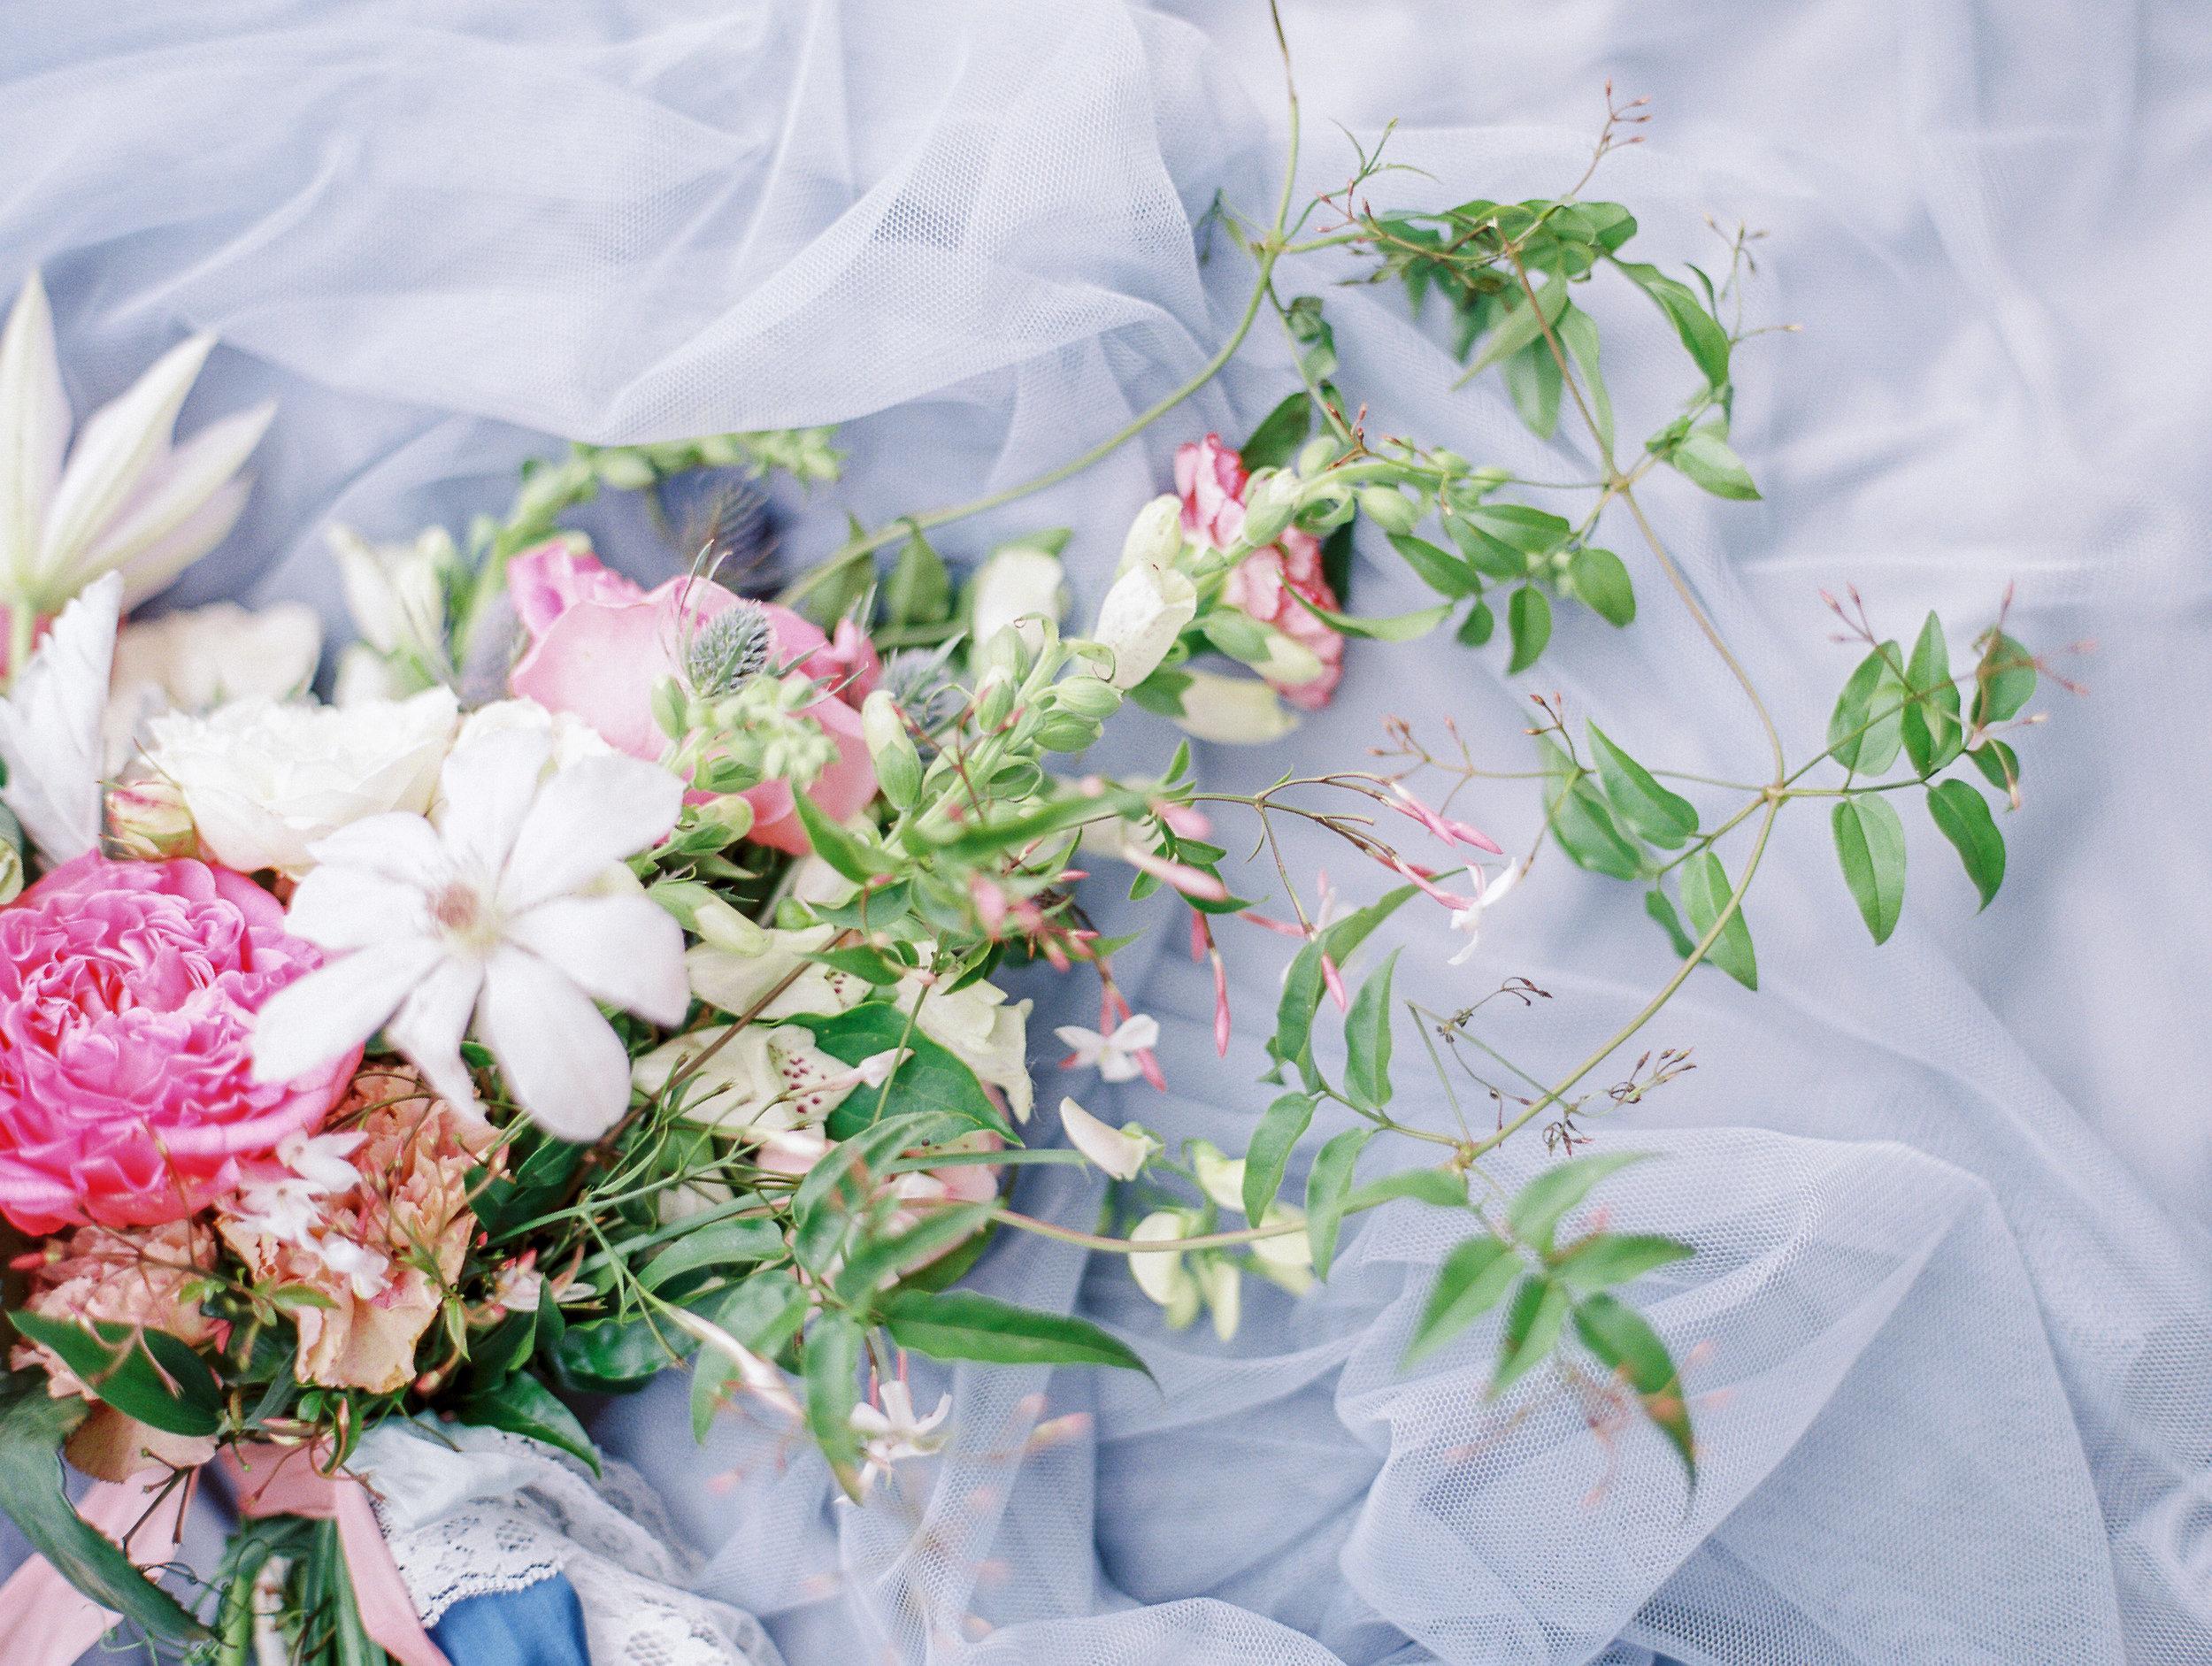 ERIC AND HALLIE WEDDING-HI RESOLUTION FOR PRINTING-0034.jpg